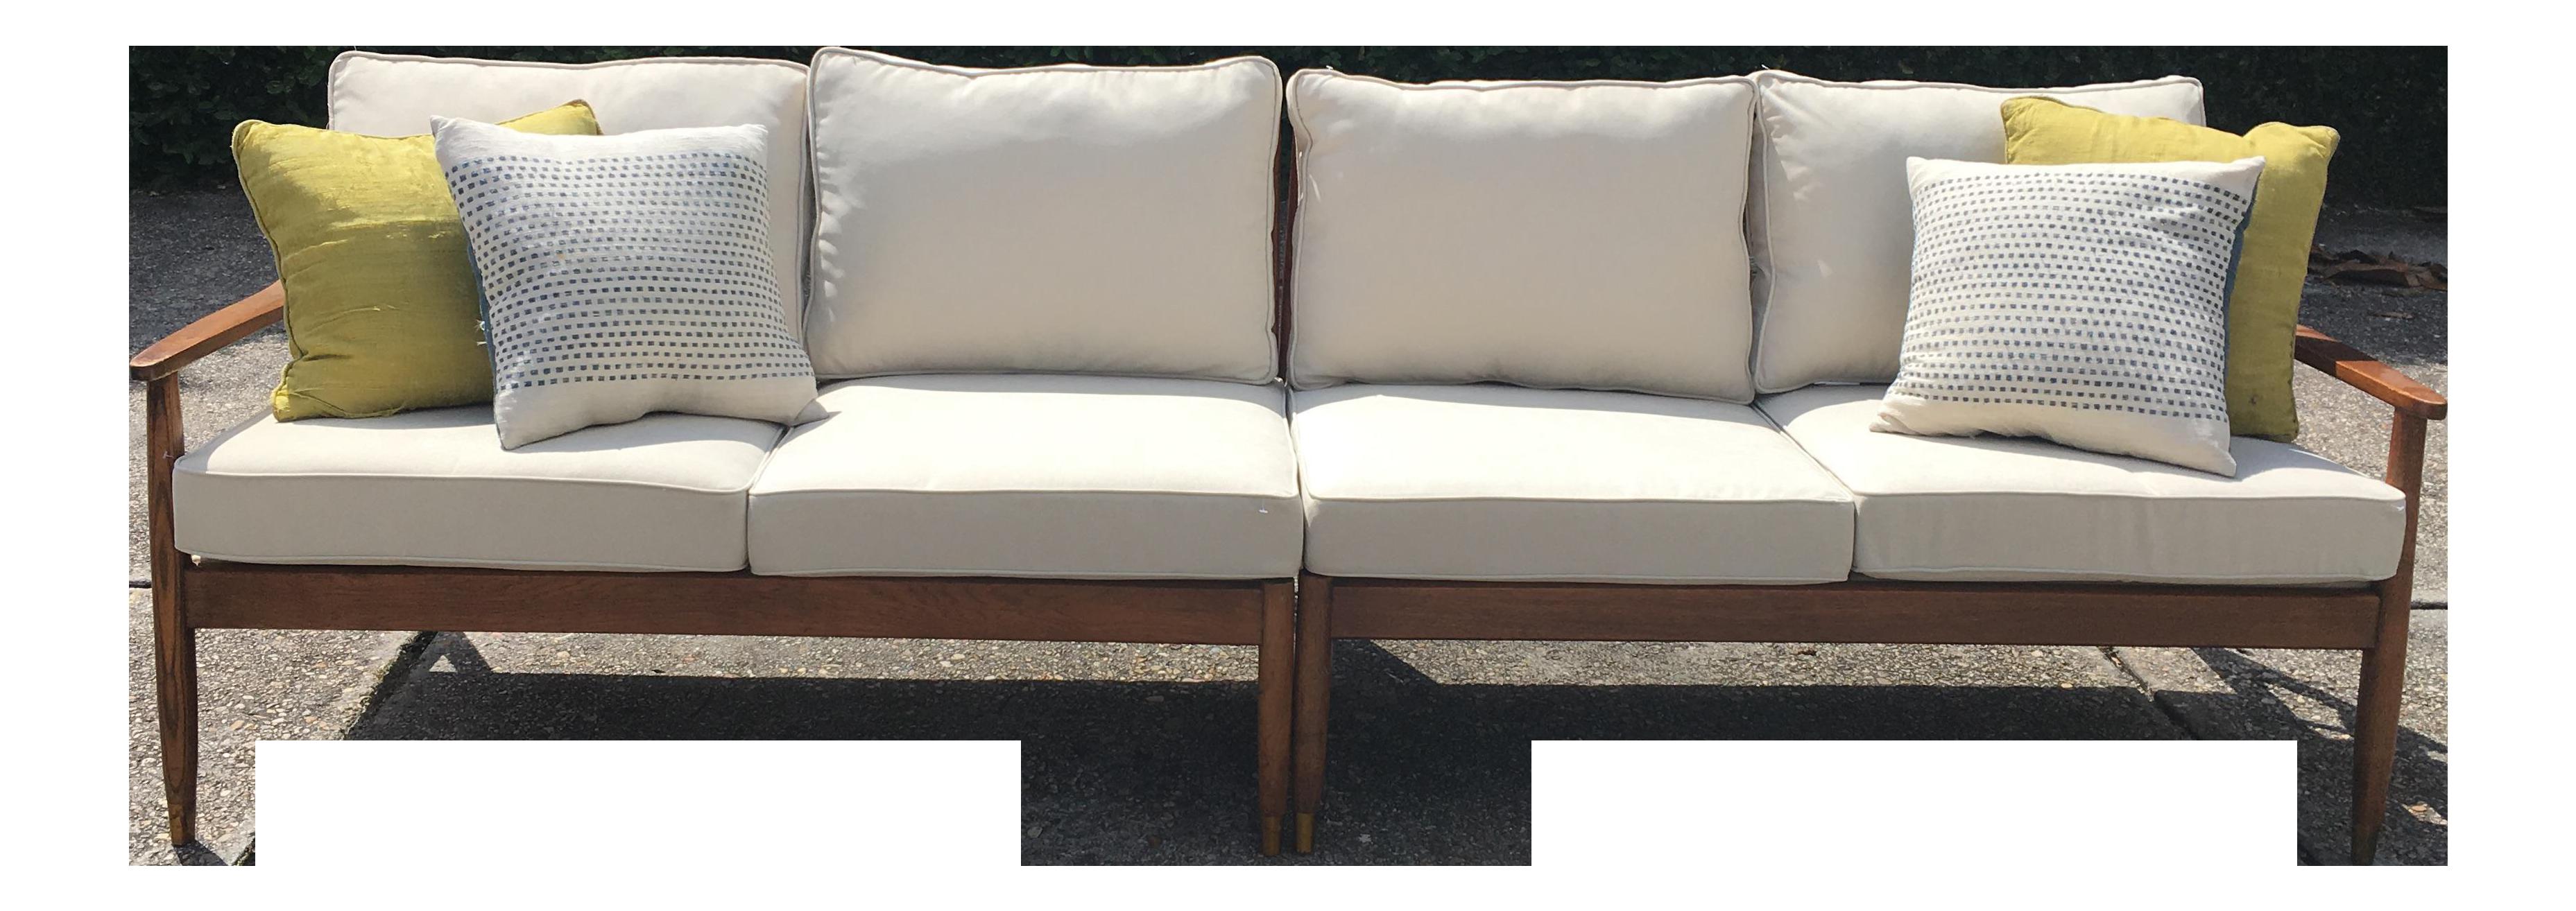 Mid Century Modern Slat Back Sectional Sofa Set